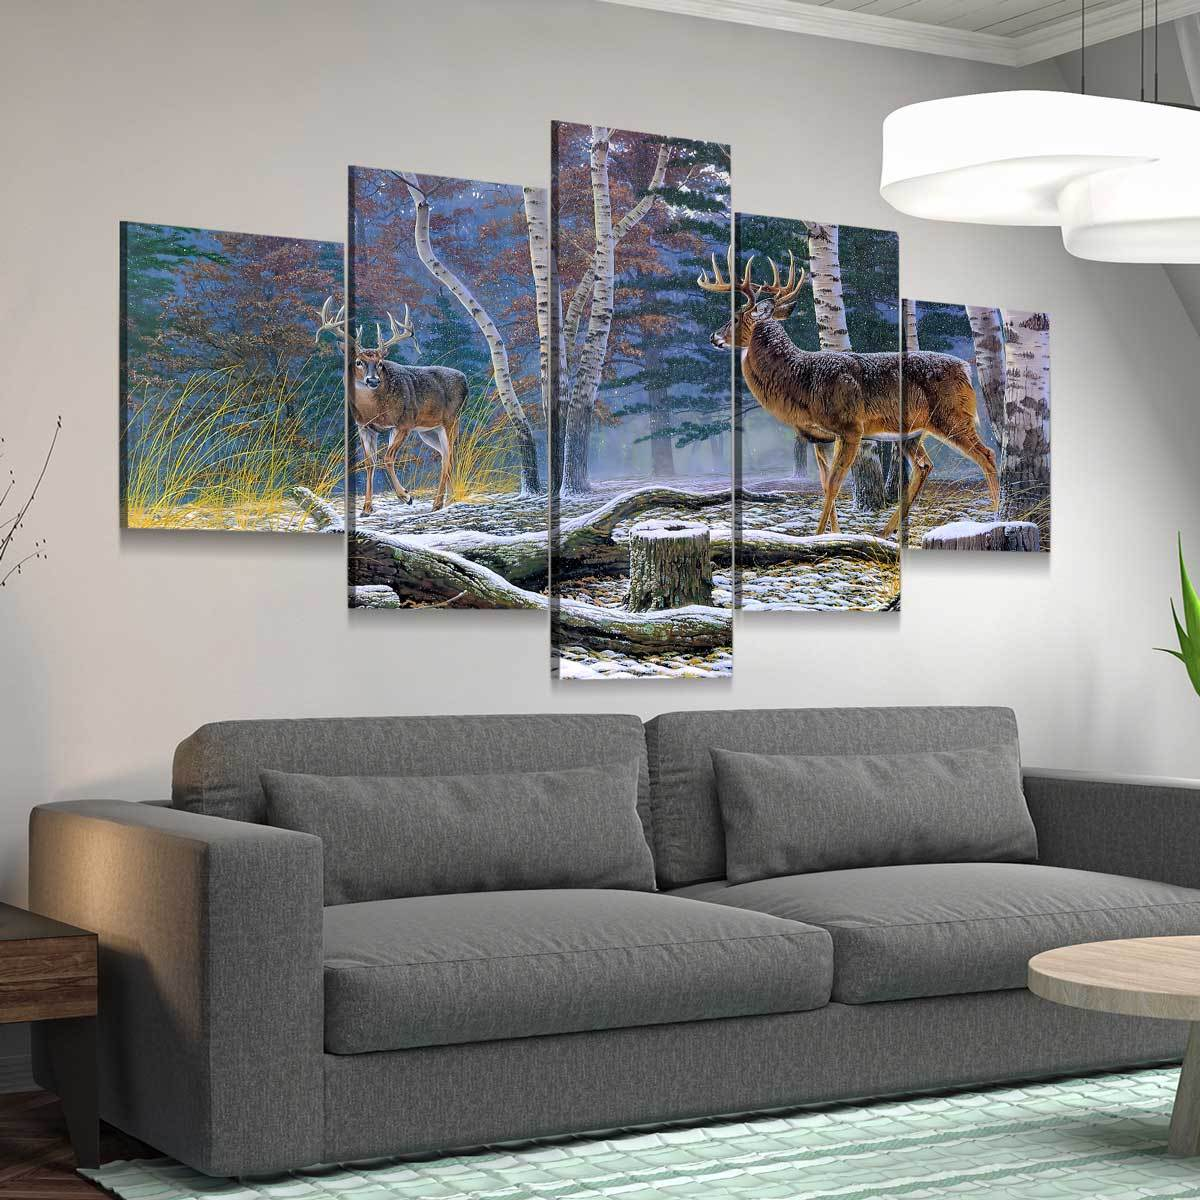 Who's King Buck 5 panel canvas wall art